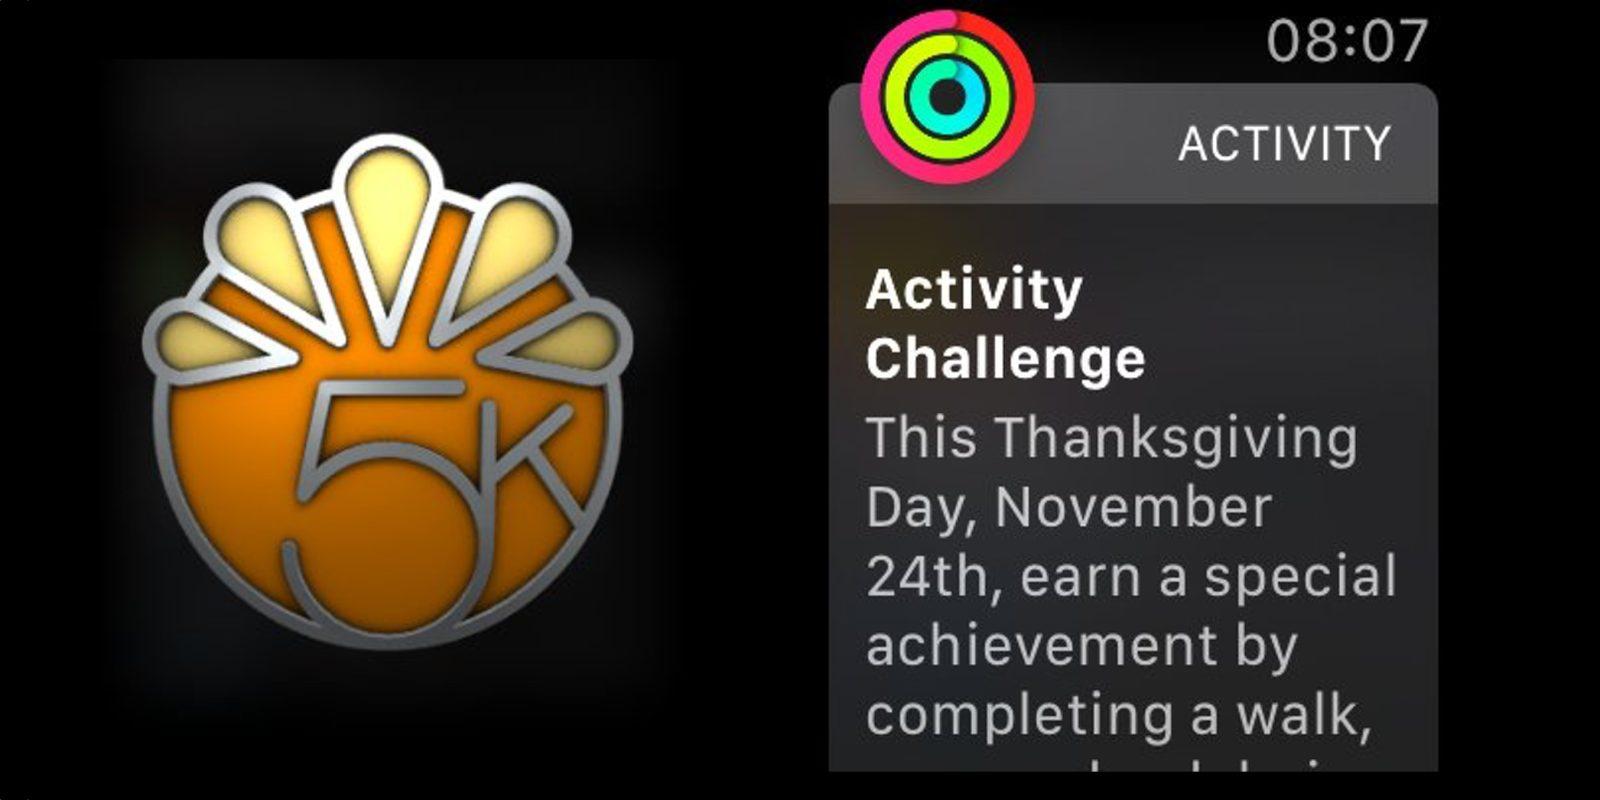 Apple Watch Has A Special Thanksgiving Activity Achievement Run